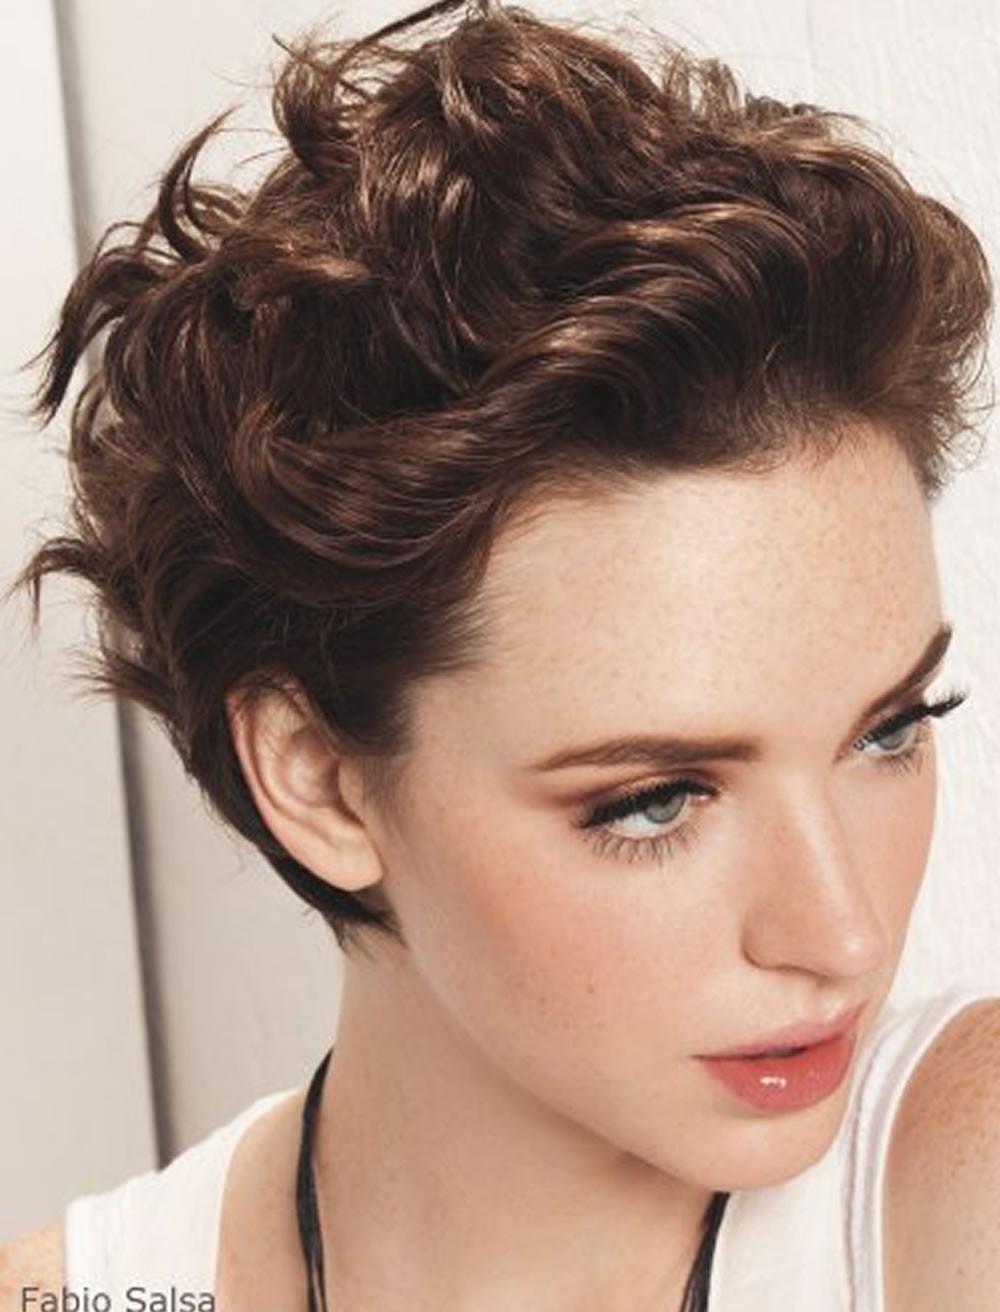 Haircuts Female  Top 30 Short Haircuts & Hairstyle ideas for Women